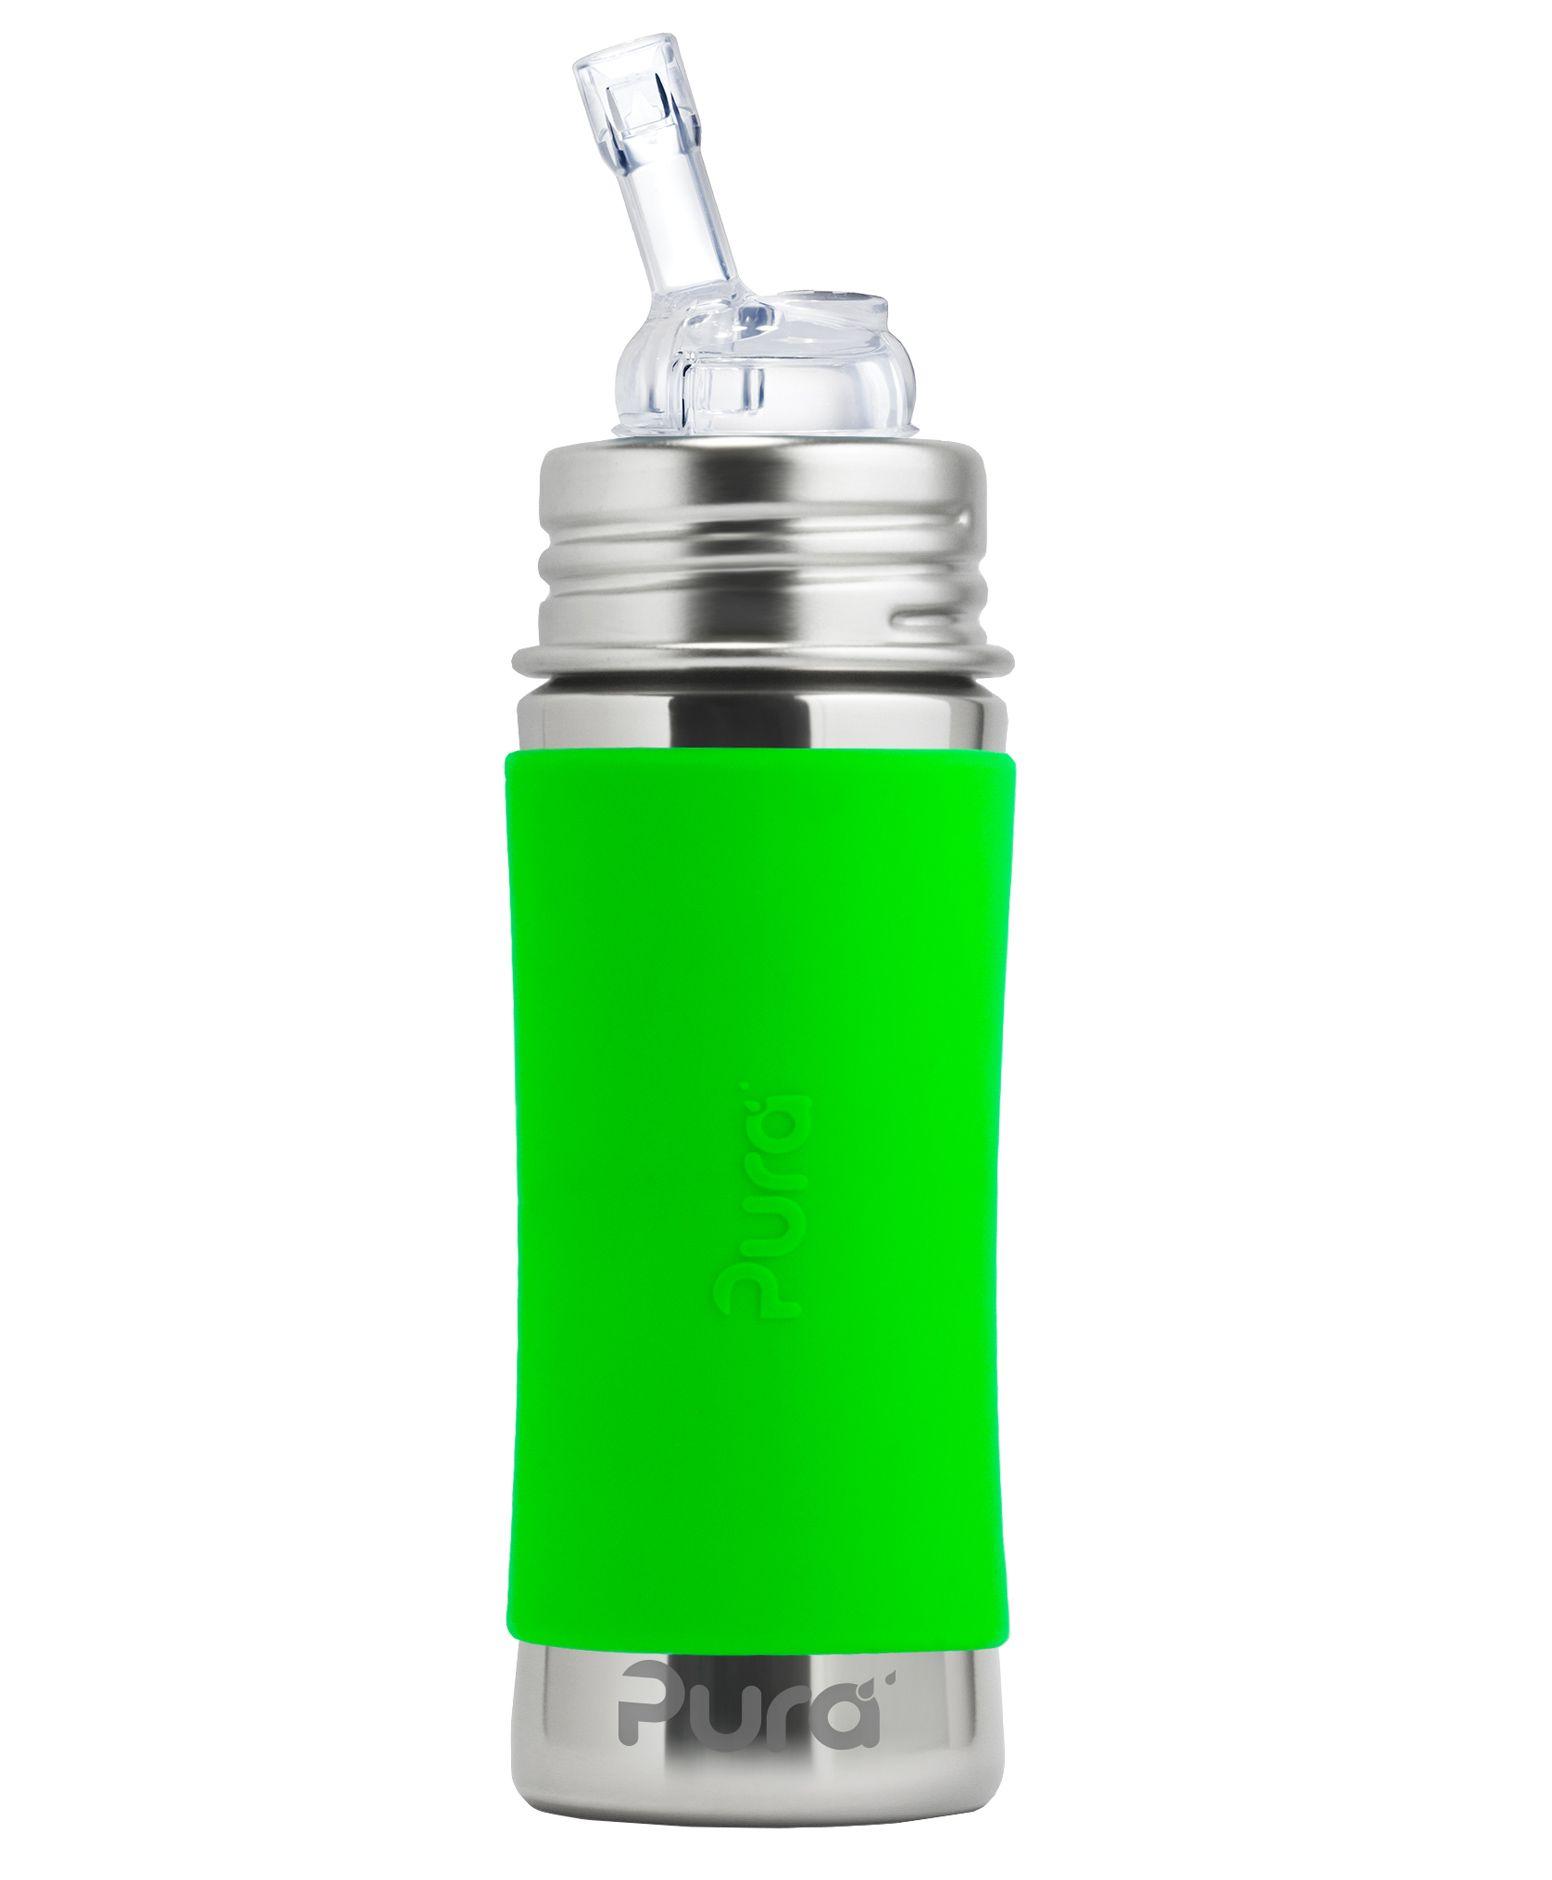 Pura Kiki Sleeve Straw Stainless Steel Bottle Green - 325 ml